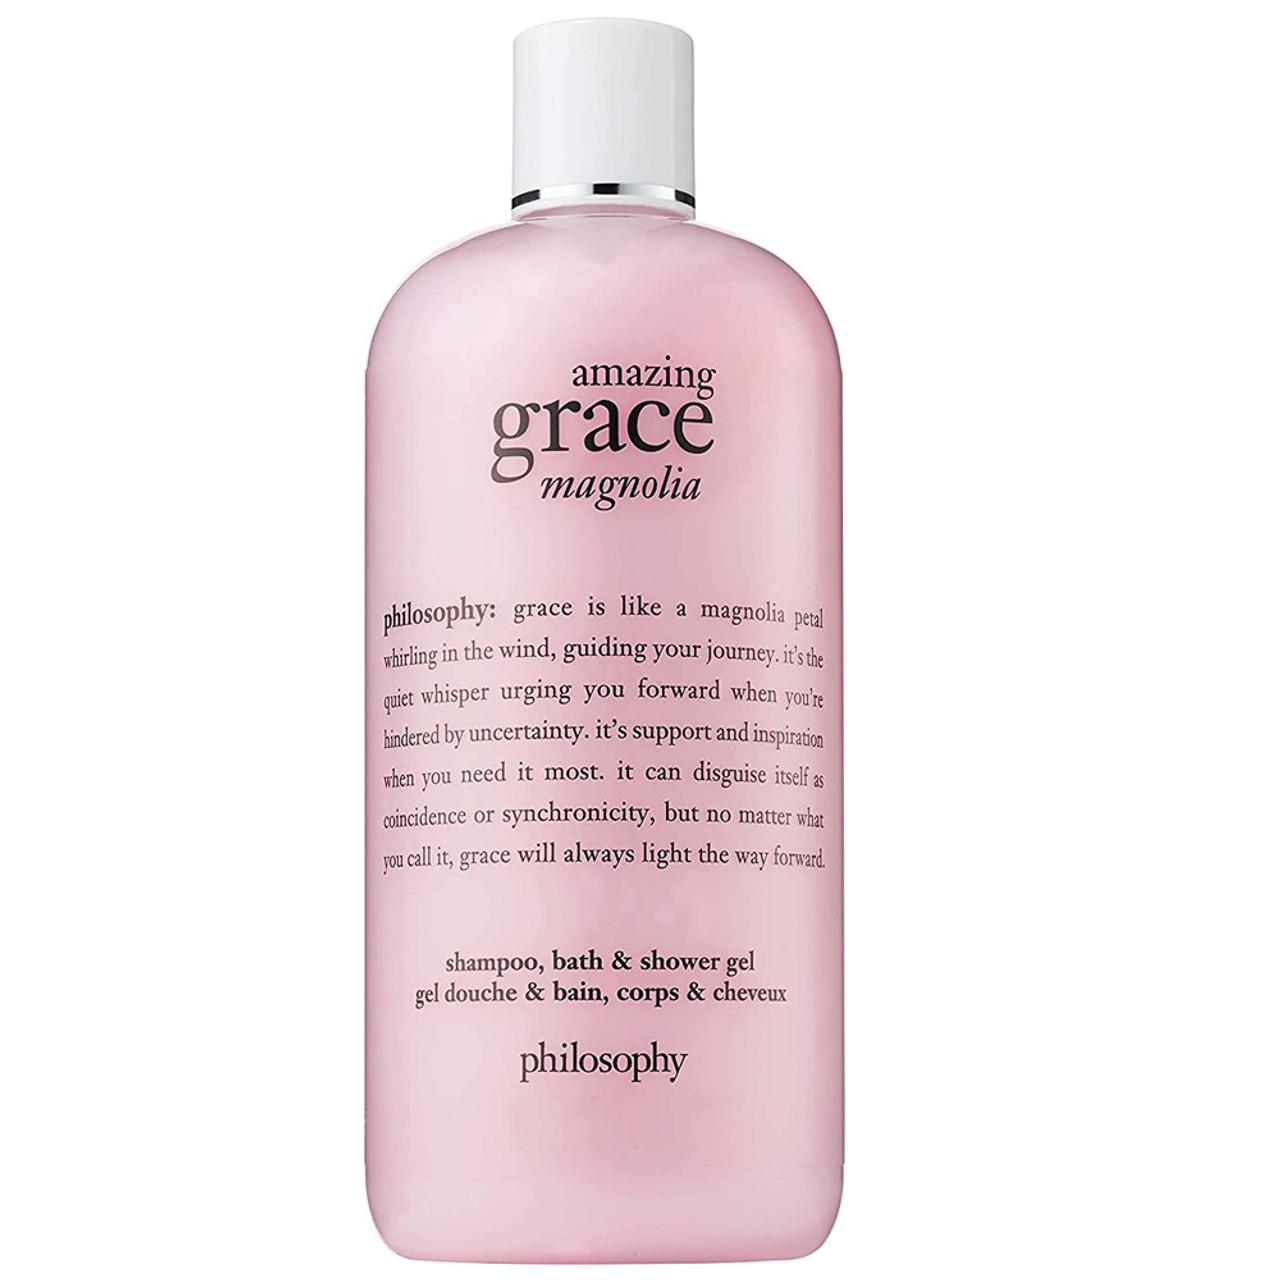 philosophy Amazing Grace Magnolia Shower Gel BeautifiedYou.com